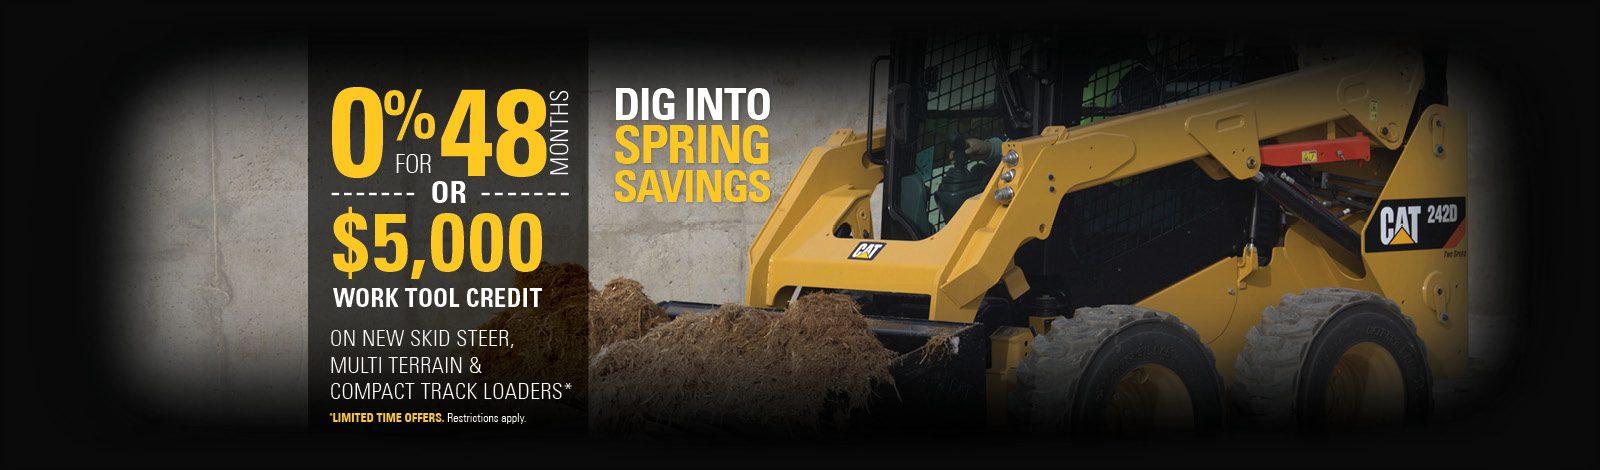 dig_into_spring_3